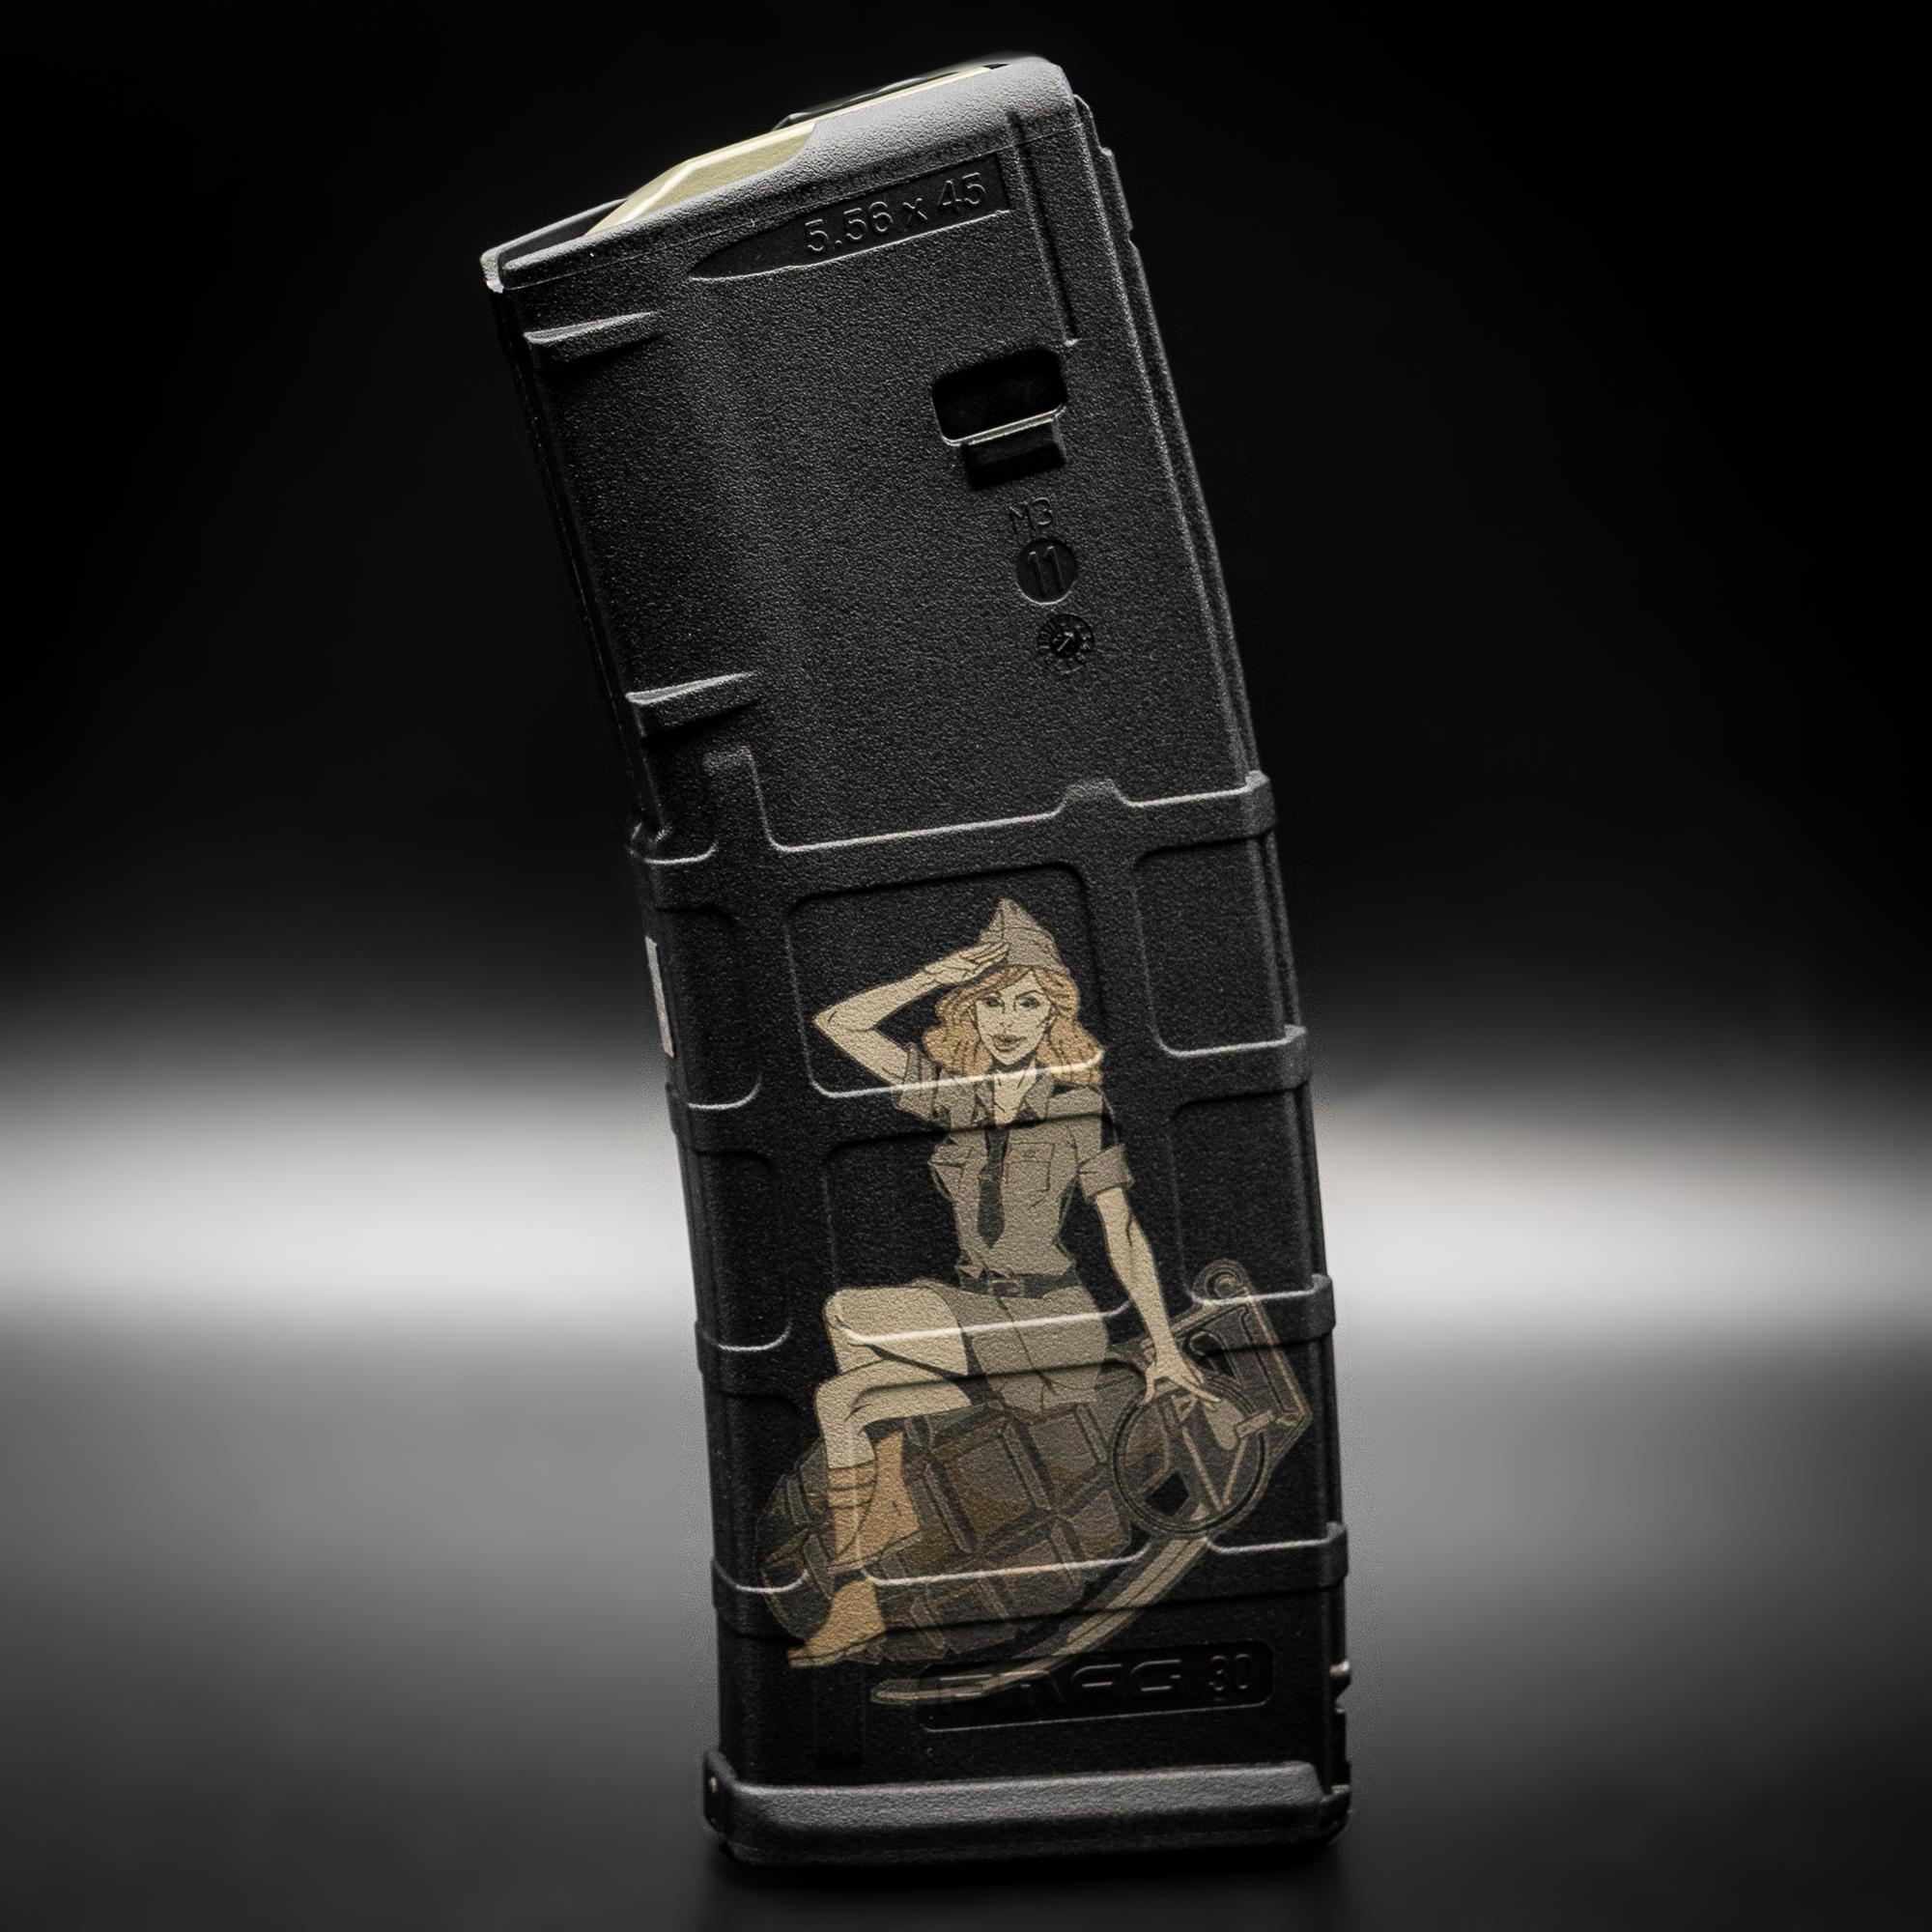 PMAG Custom Engraved 30RD PMAG for AR-15